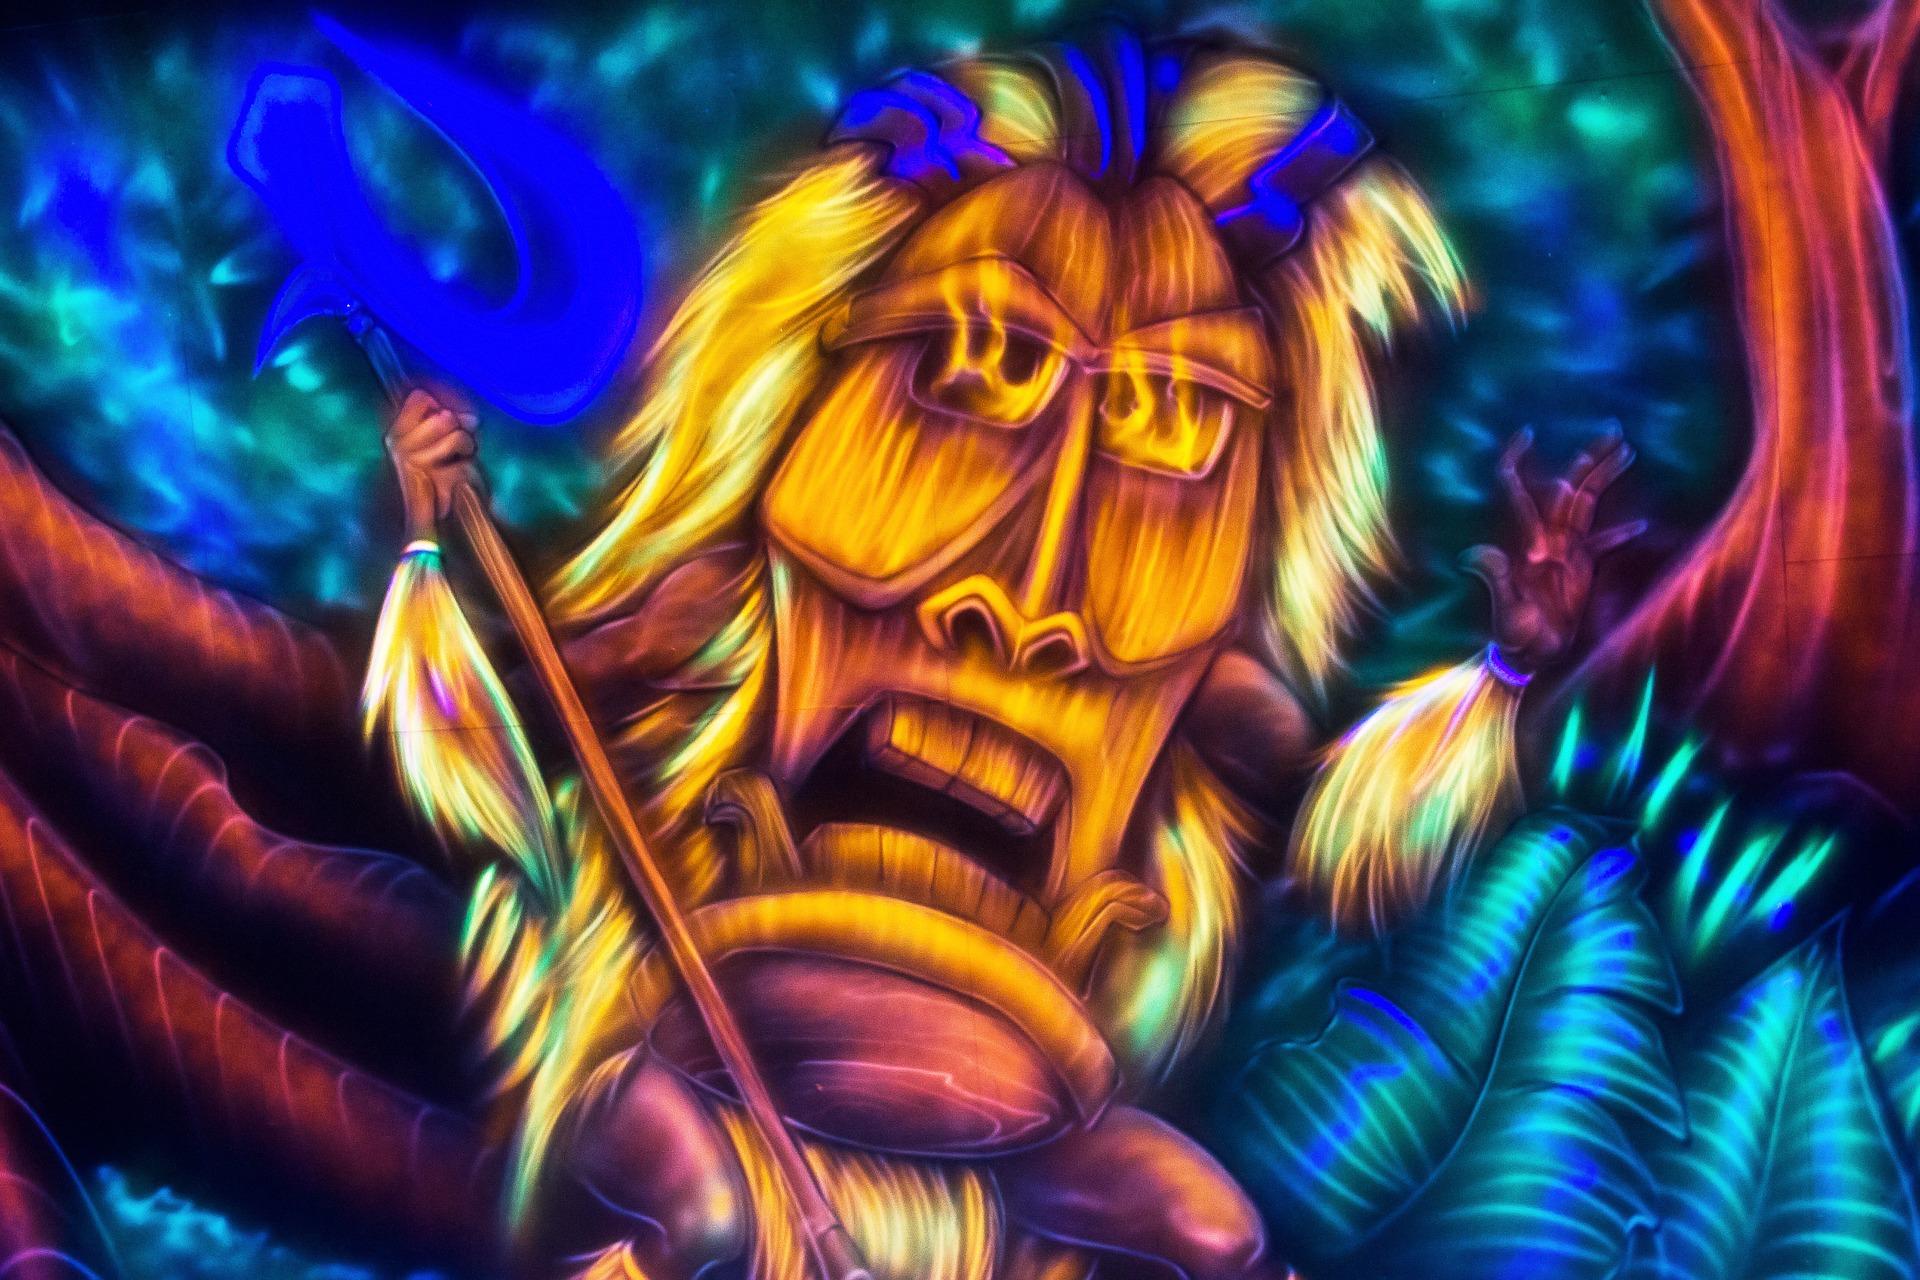 Kim byli indiańscy szamani?